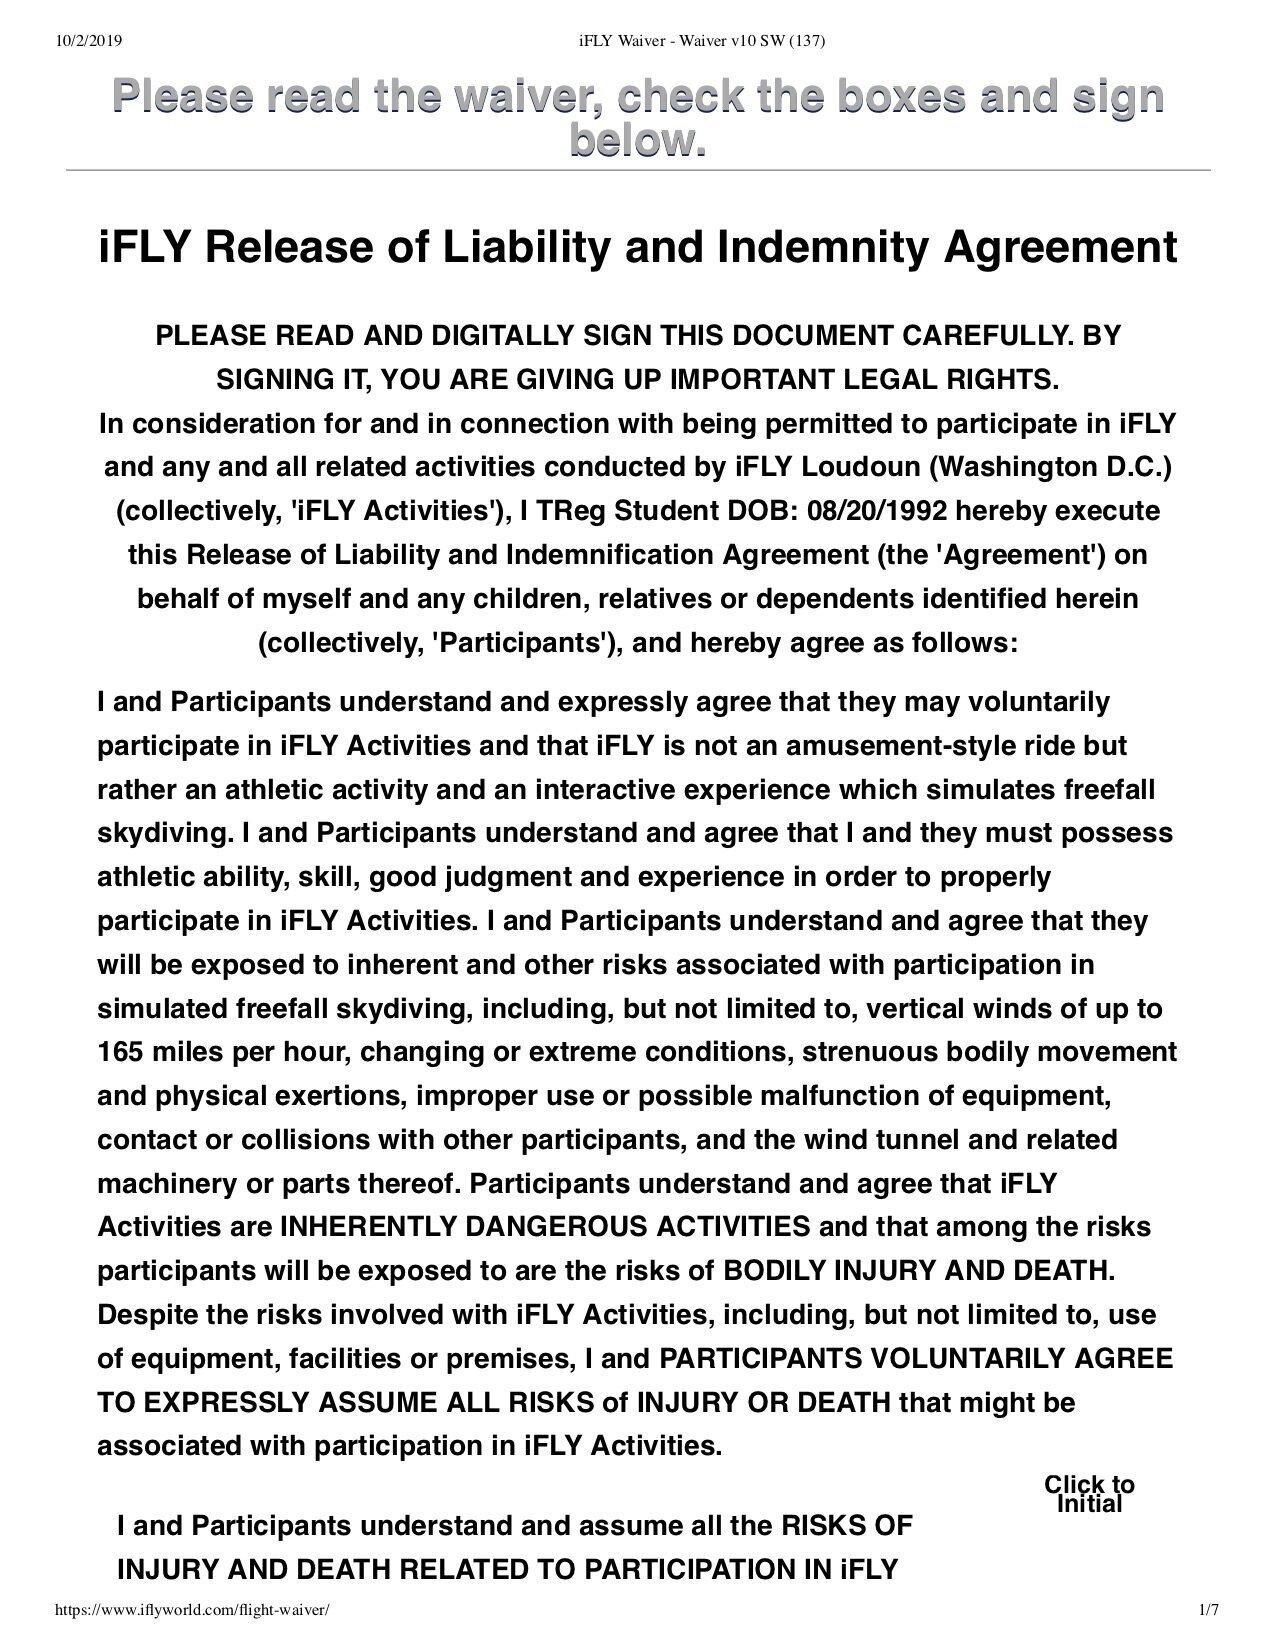 Copy+of+Flight+Waiver+-+iFLY+Holdings,+Inc.jpg